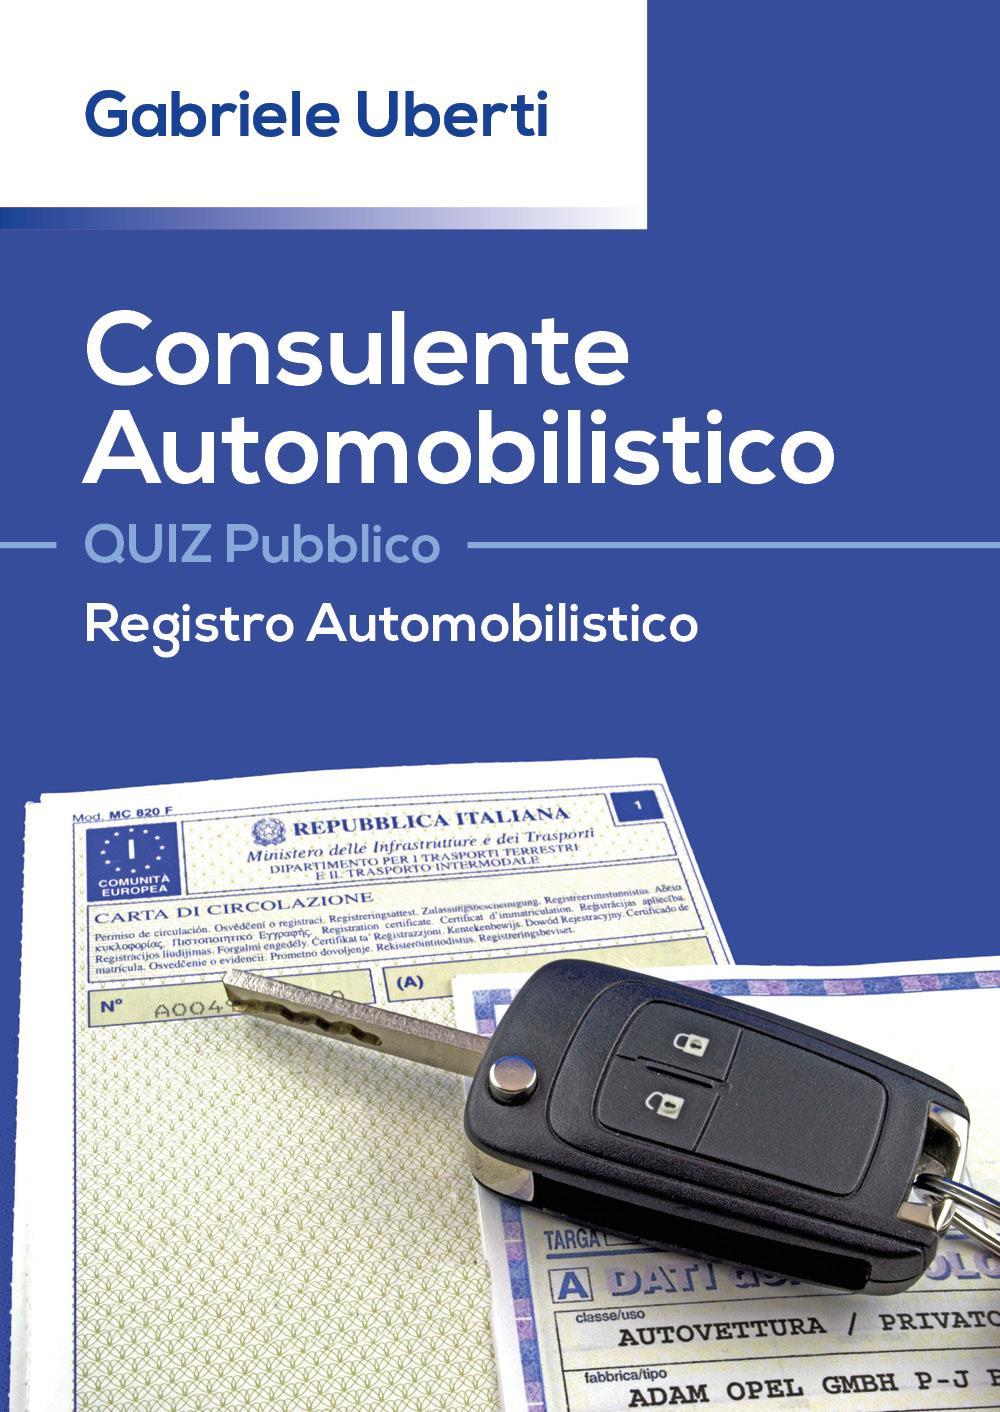 Consulente Automobilistico QUIZ Pubblico Registro Automobilistico